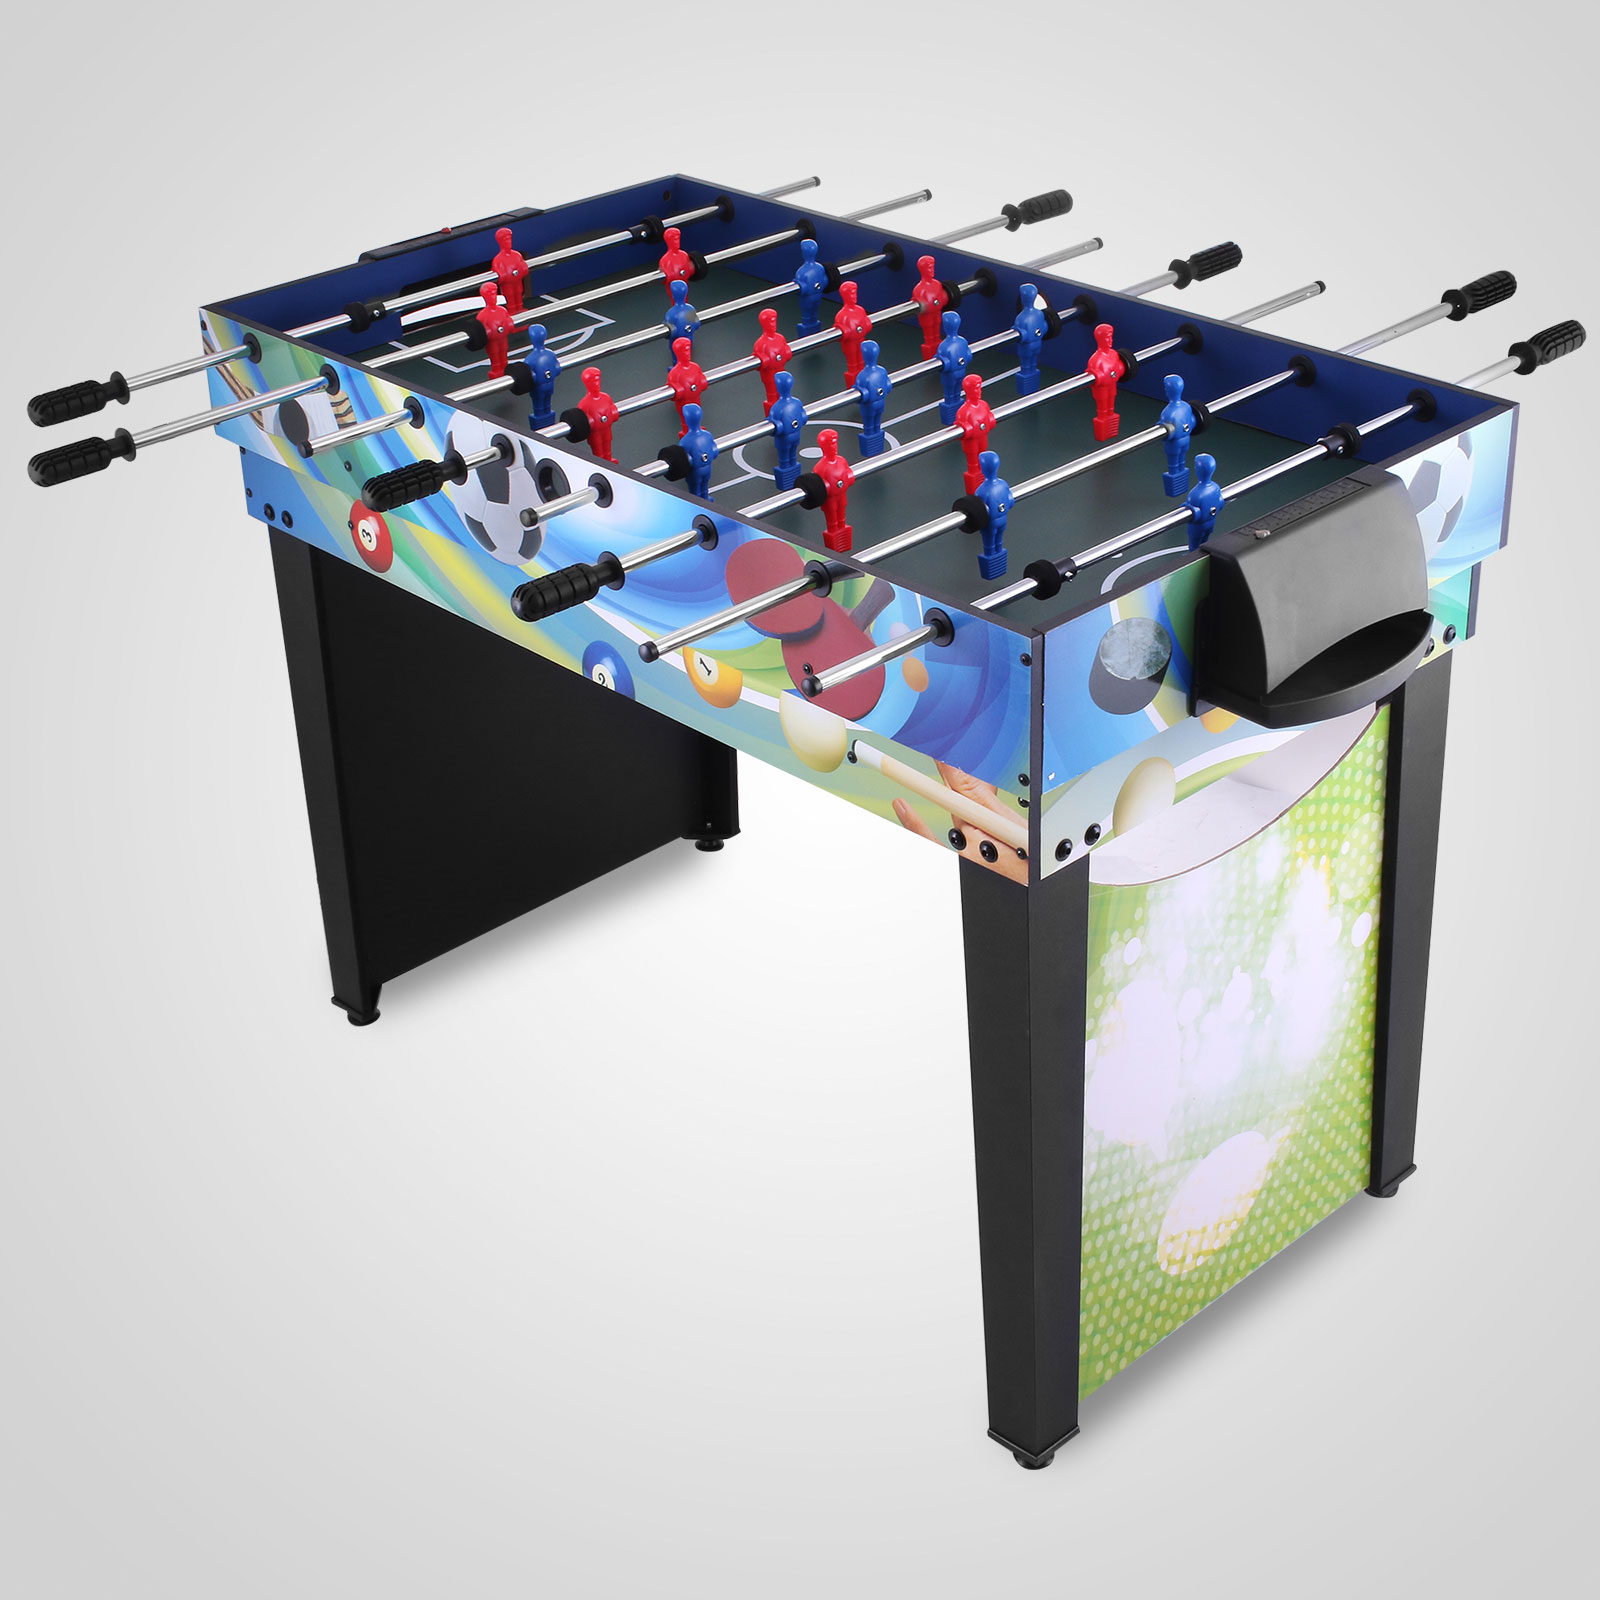 12 in 1 table tennis games air hockey pool foosball soccer for 12 in 1 game table